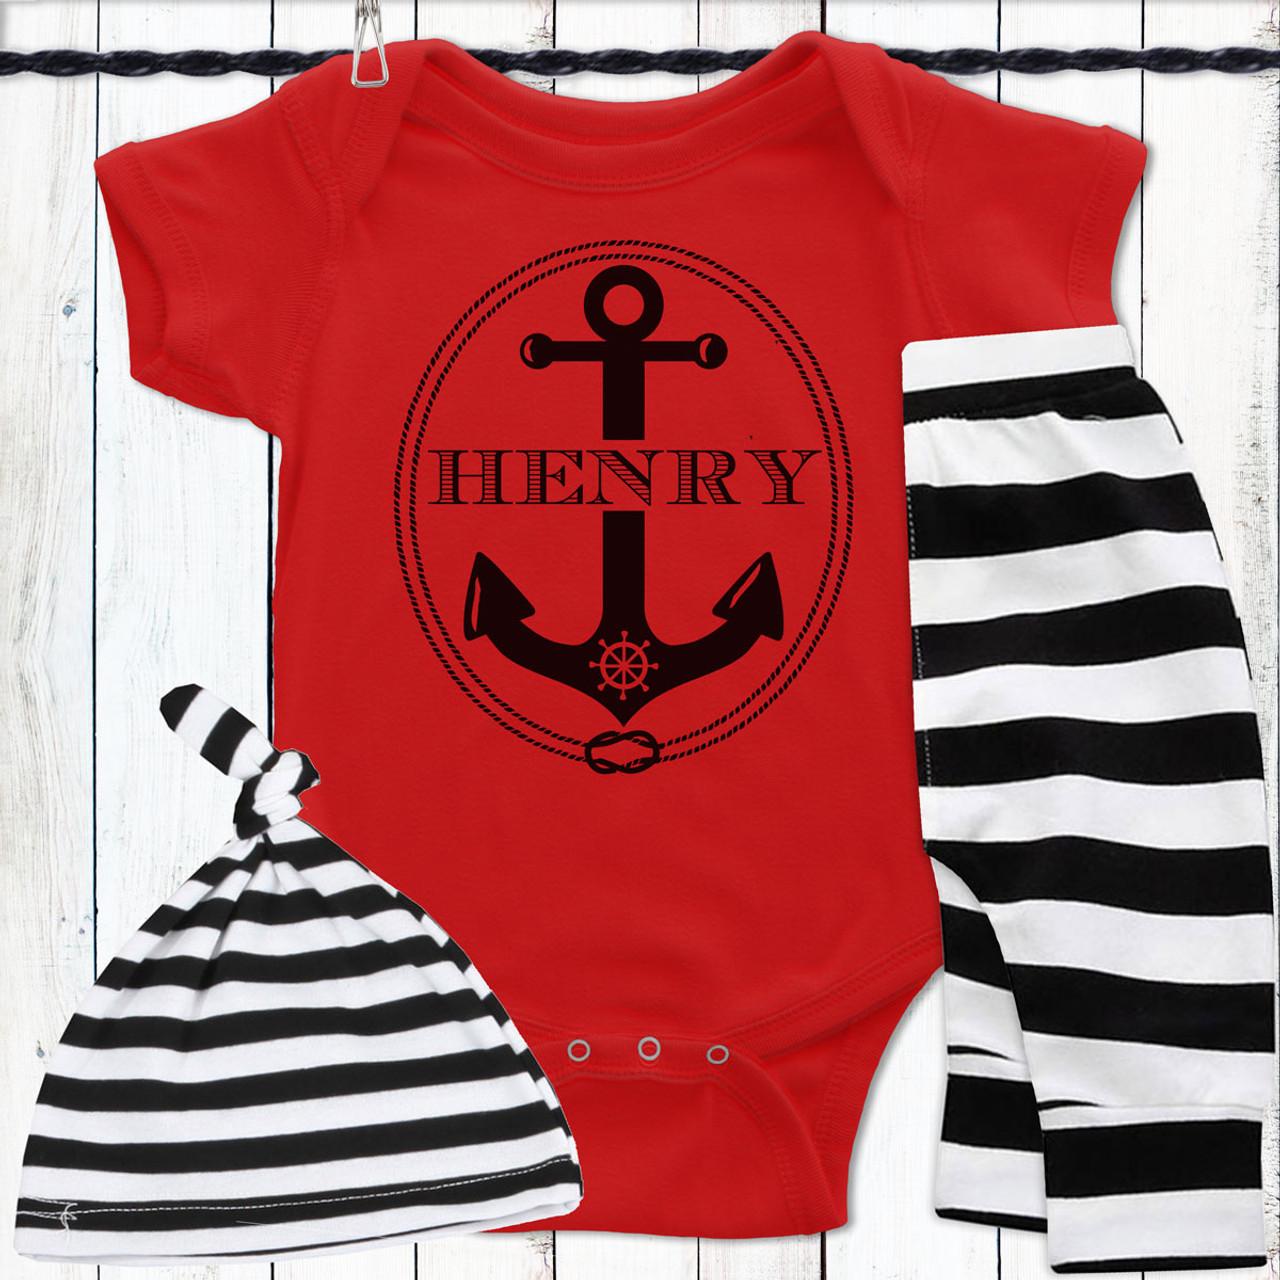 99e2b5893b8c6 Personalized Ahoy, Baby! Gift Set - Nautical Anchor Baby Clothing